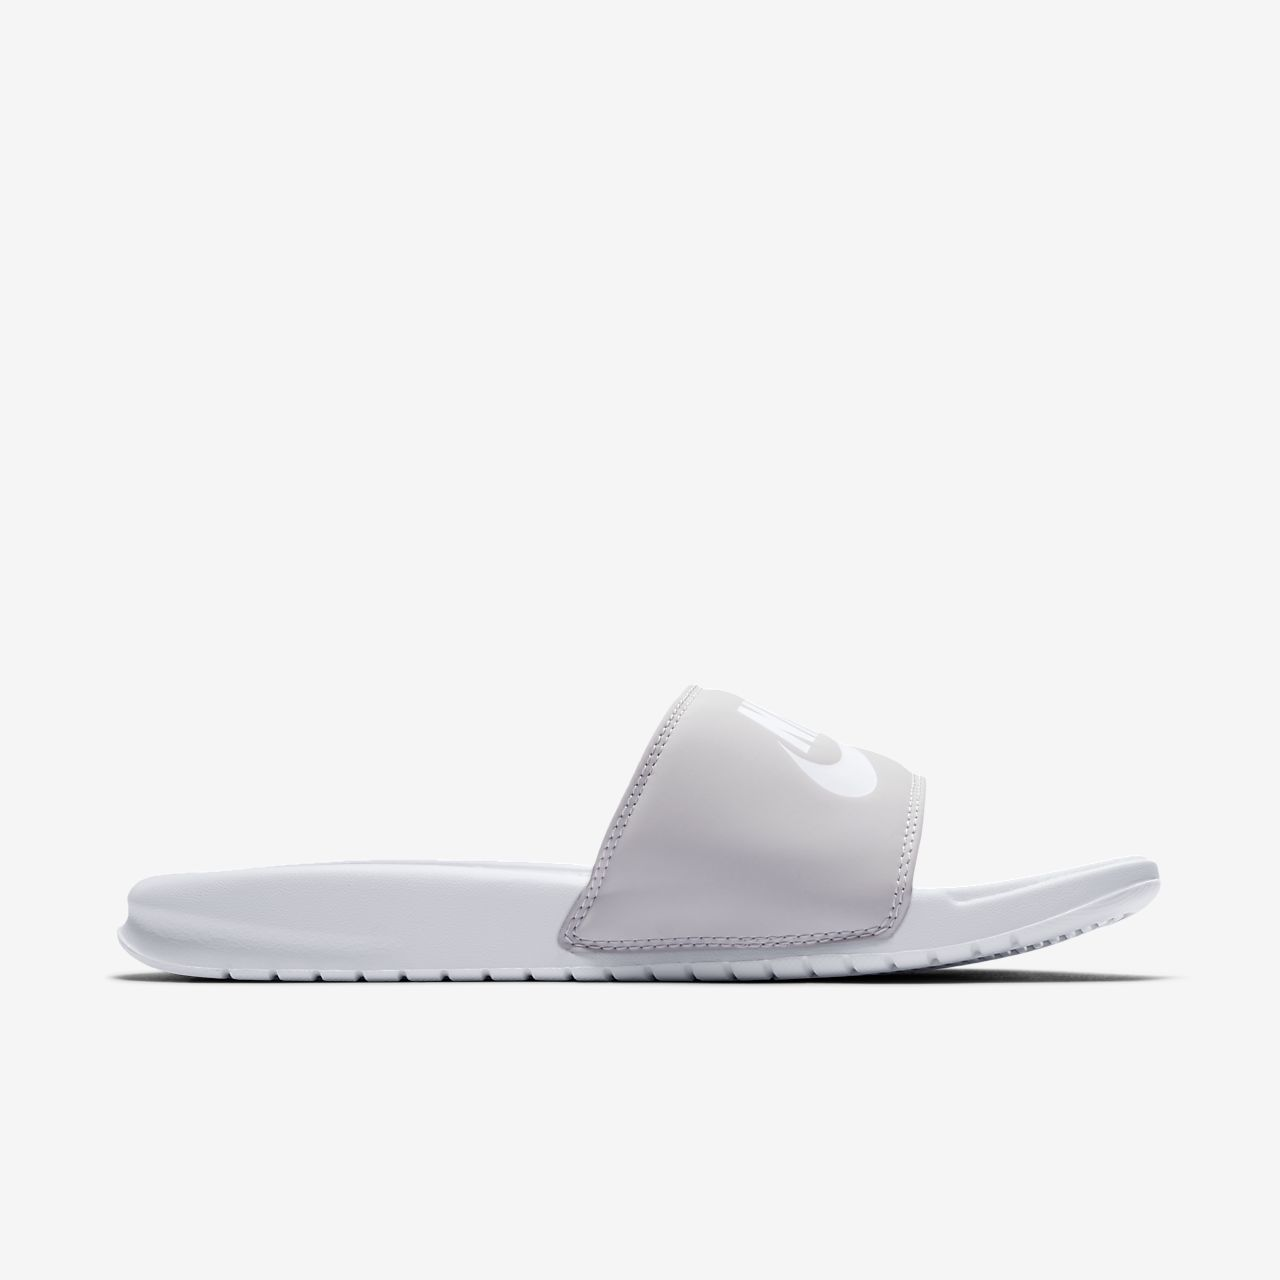 Nike Benassi Pastel QS Damen-Badeslipper - Orange MozLP4q1Ty